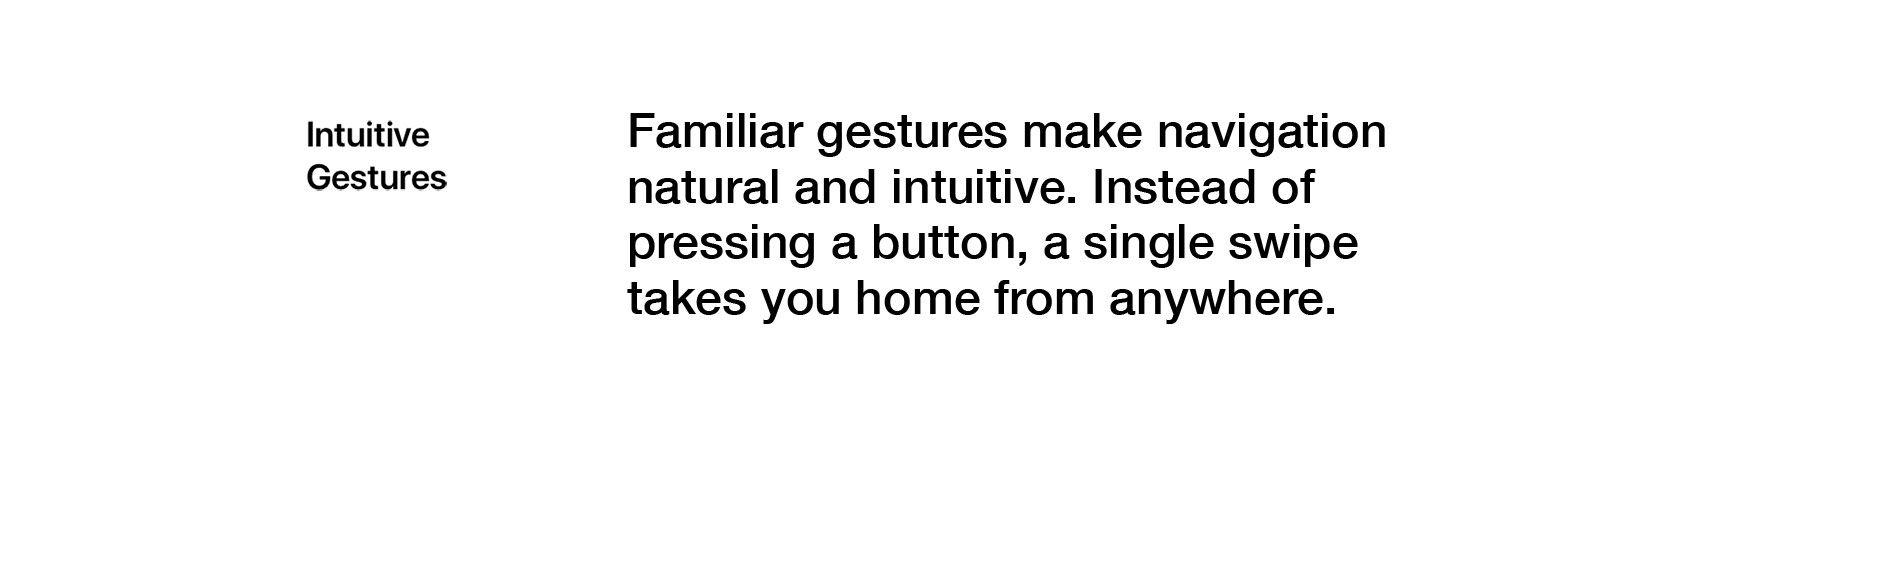 Intuitive Gestures